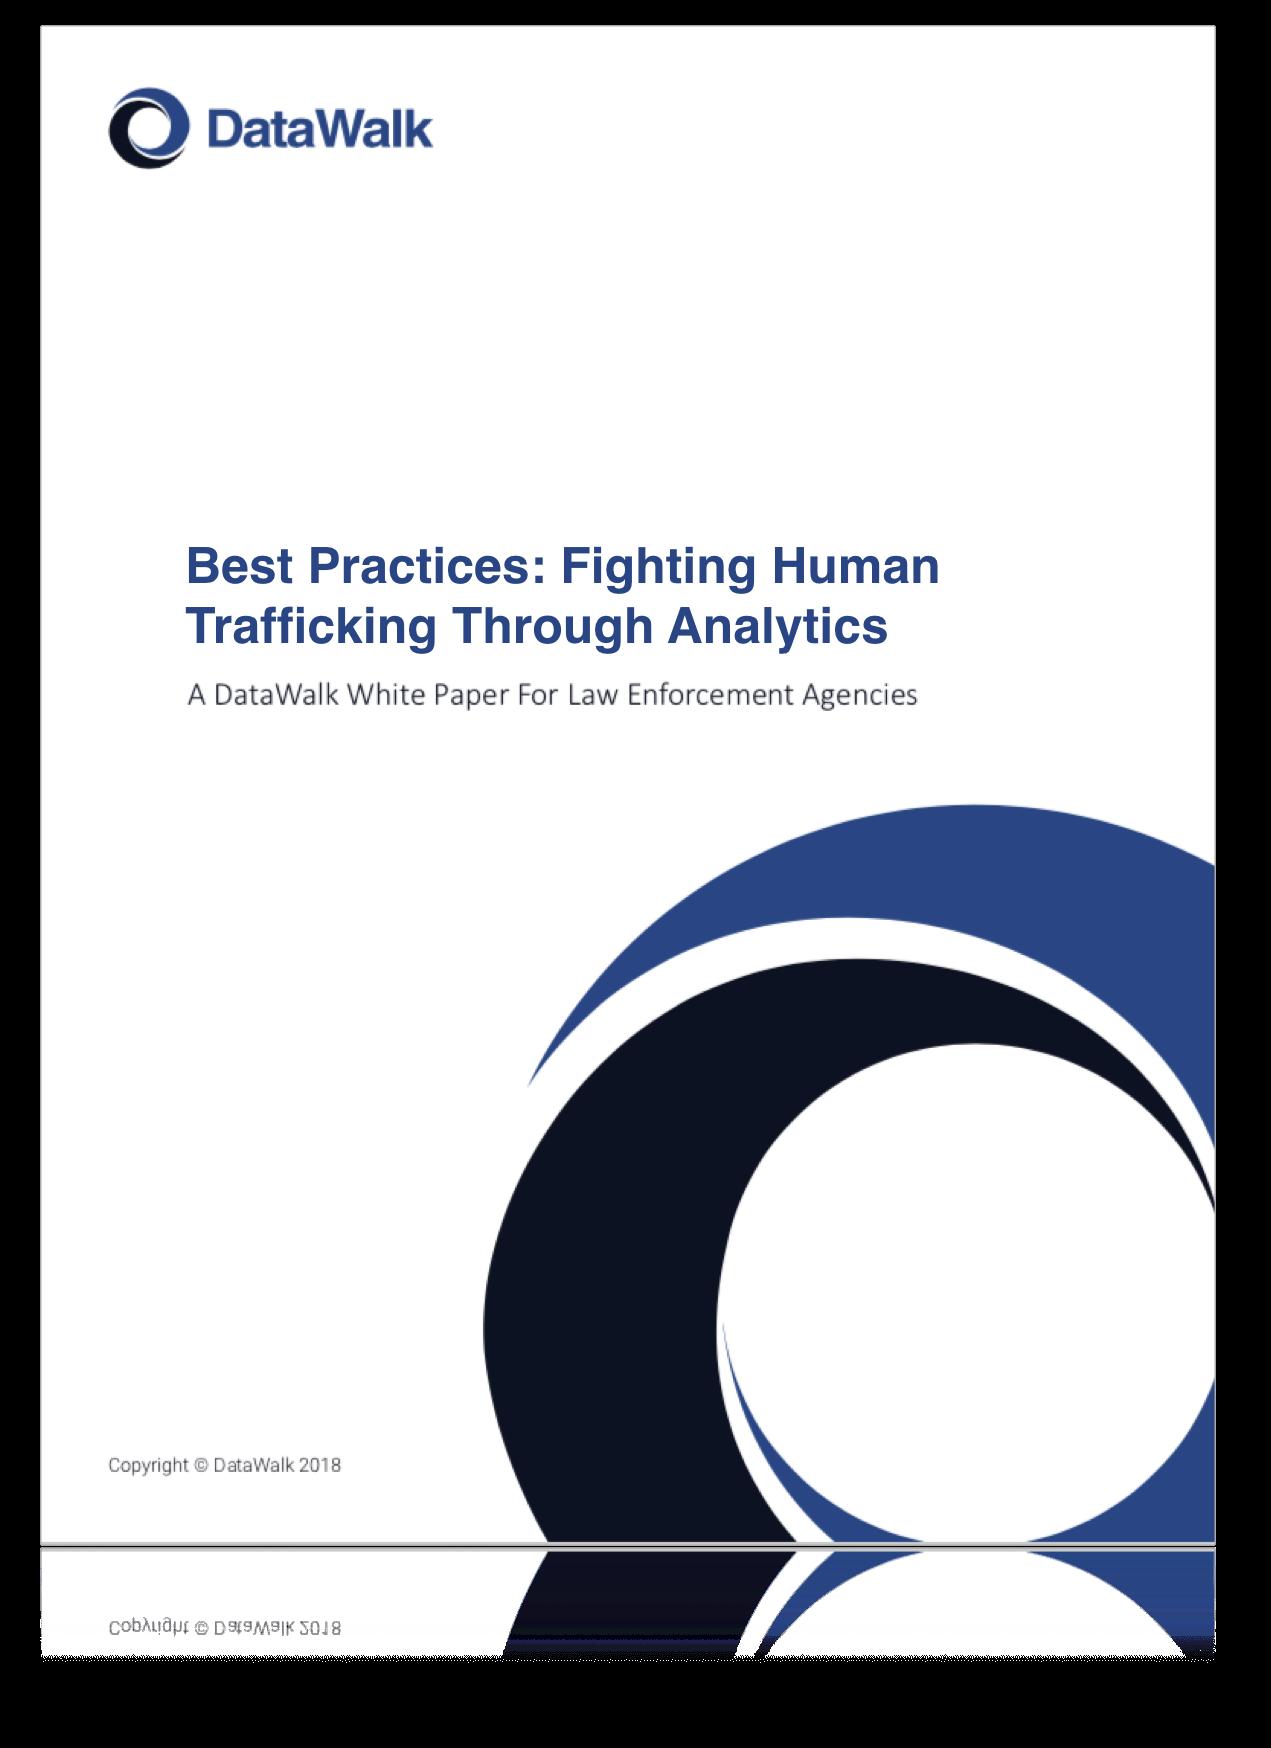 Best Practices: Fighting Human Trafficking Through Analytics